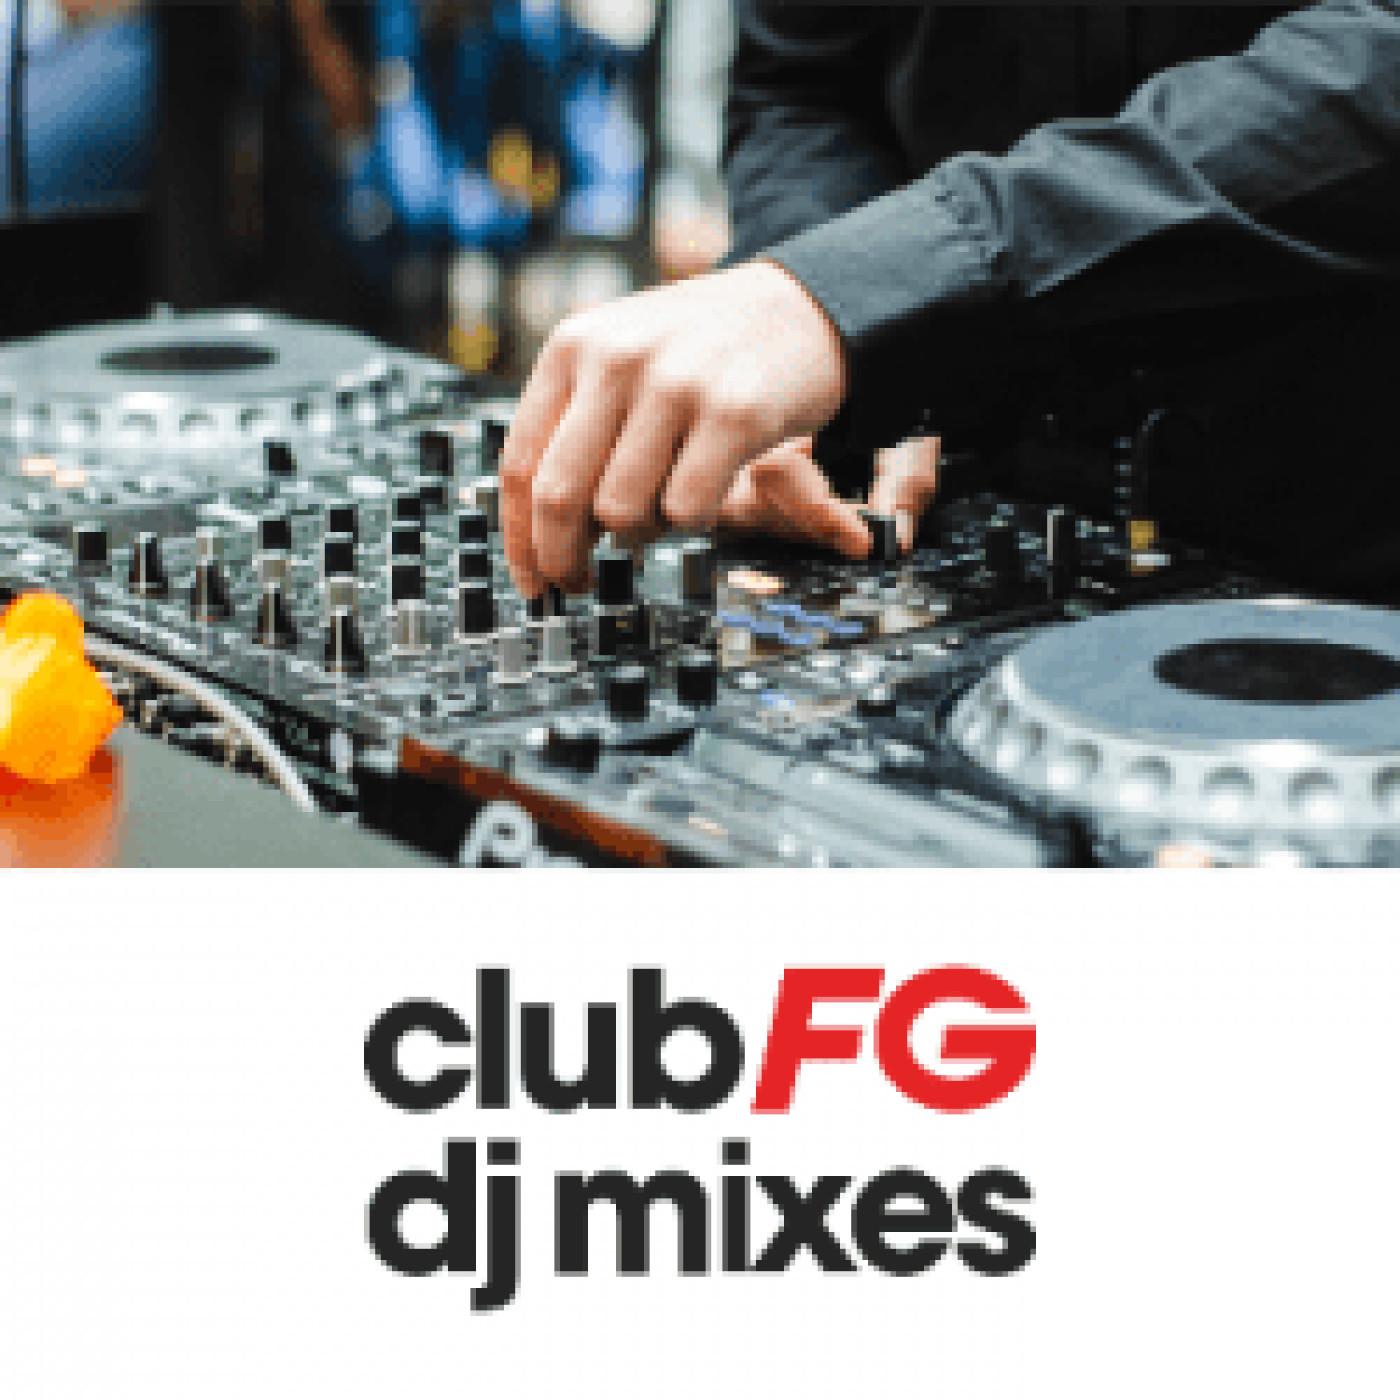 CLUB FG : SAMARAN